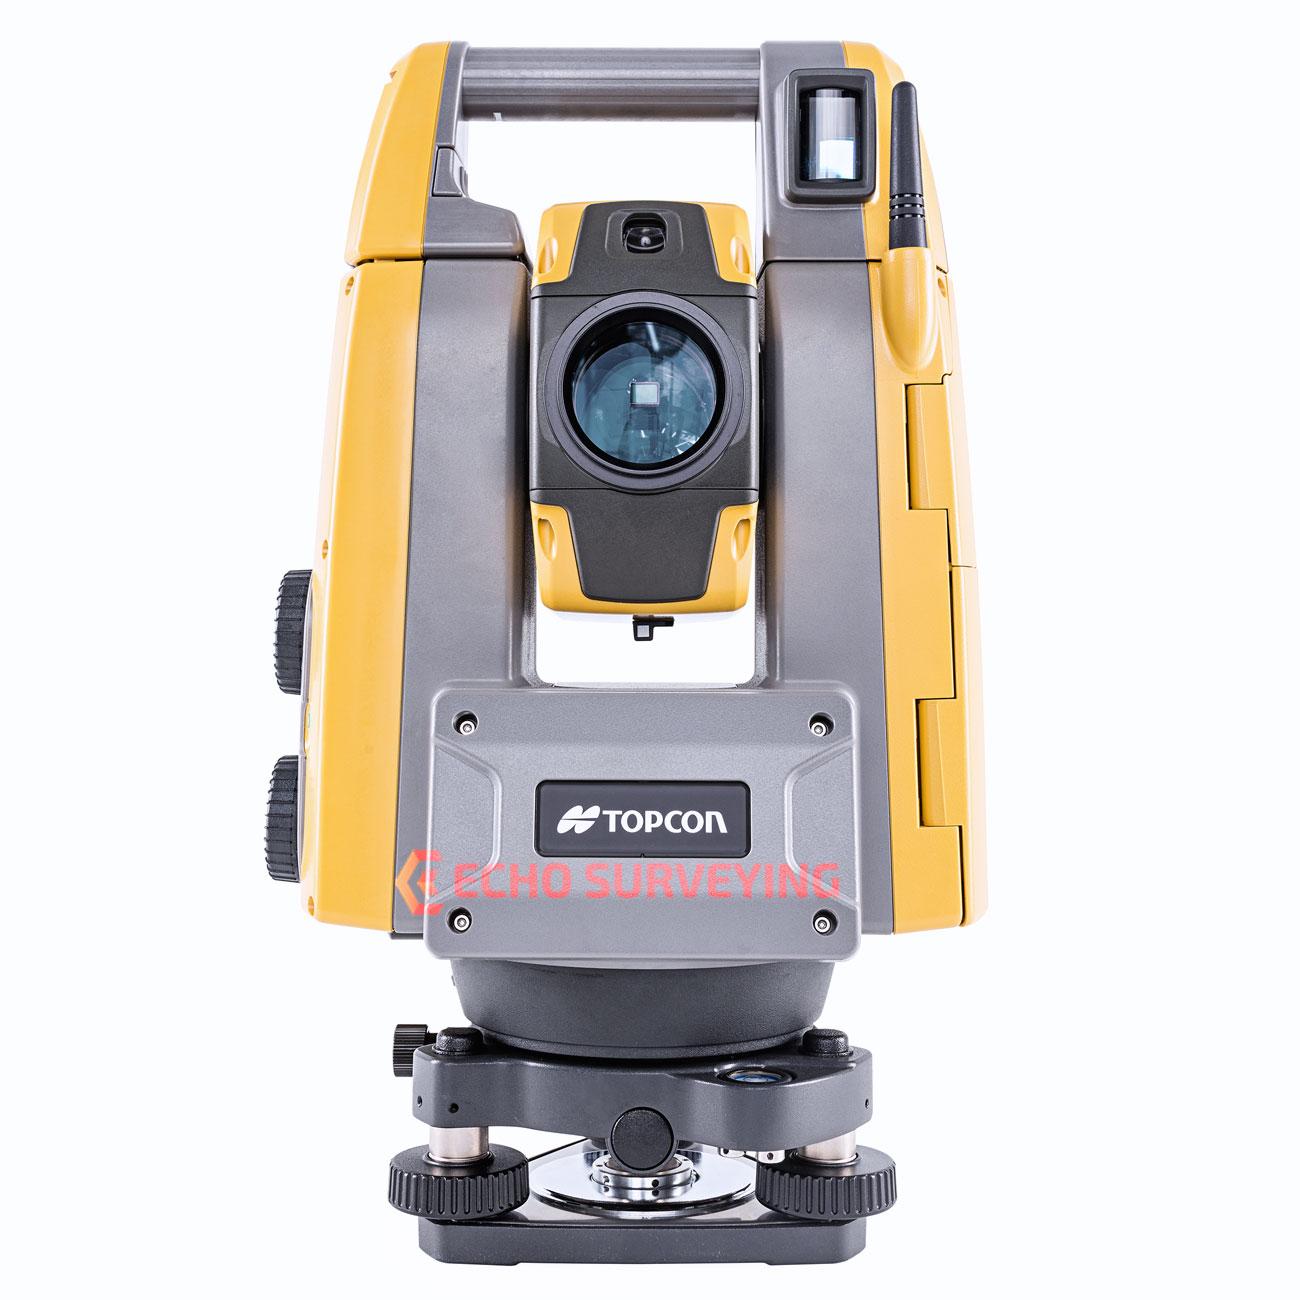 Topcon-GT-1001-Robotic-Total-Station.jpg